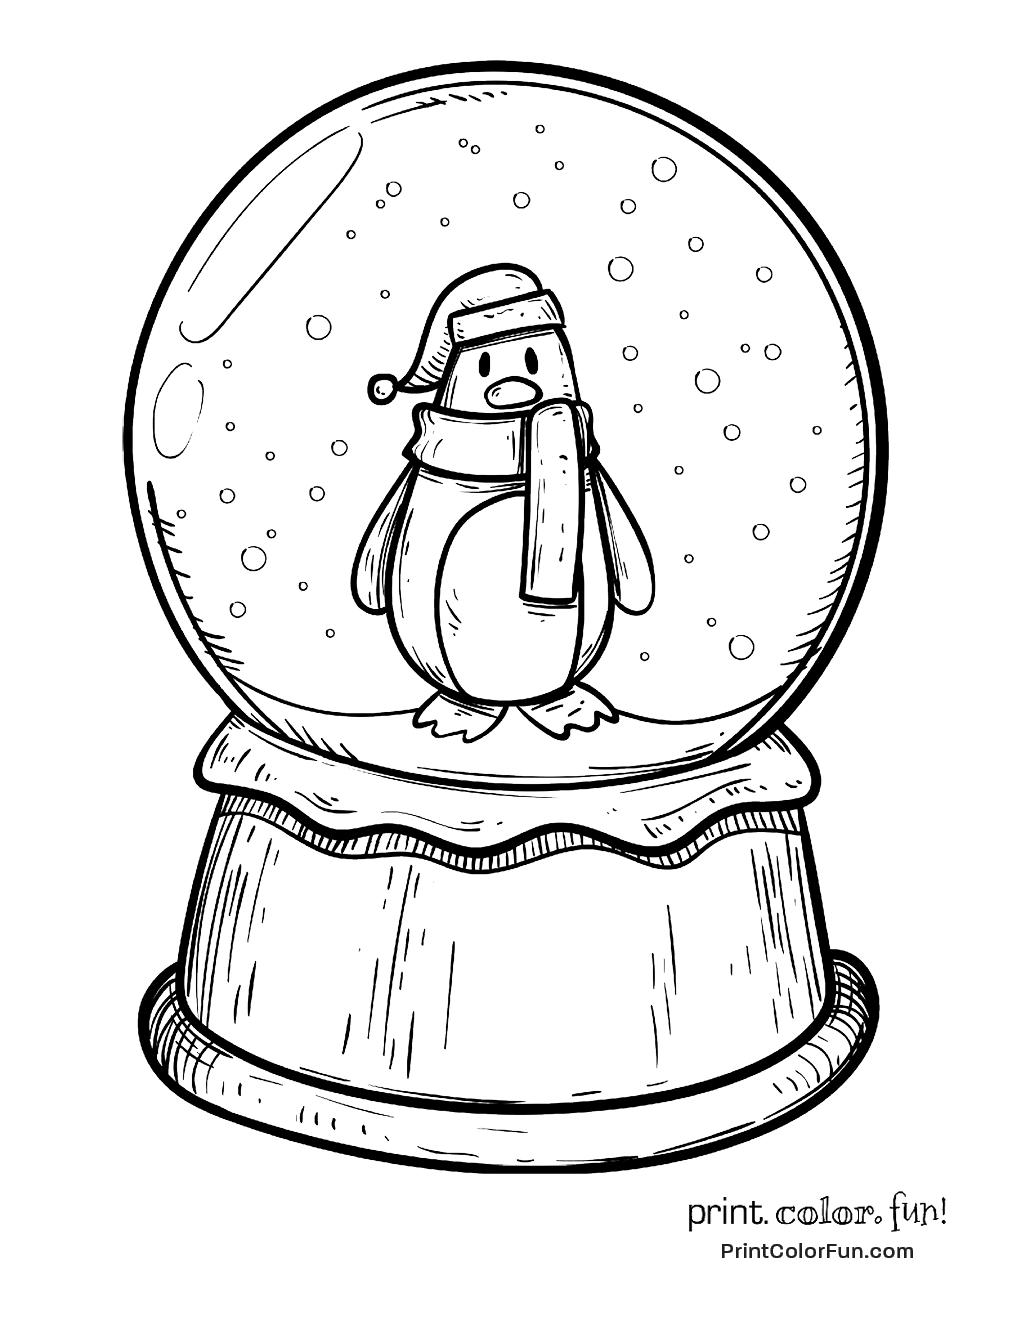 Christmas Snow Globe With Penguin Penguin Coloring Pages Globe Drawing Penguin Coloring